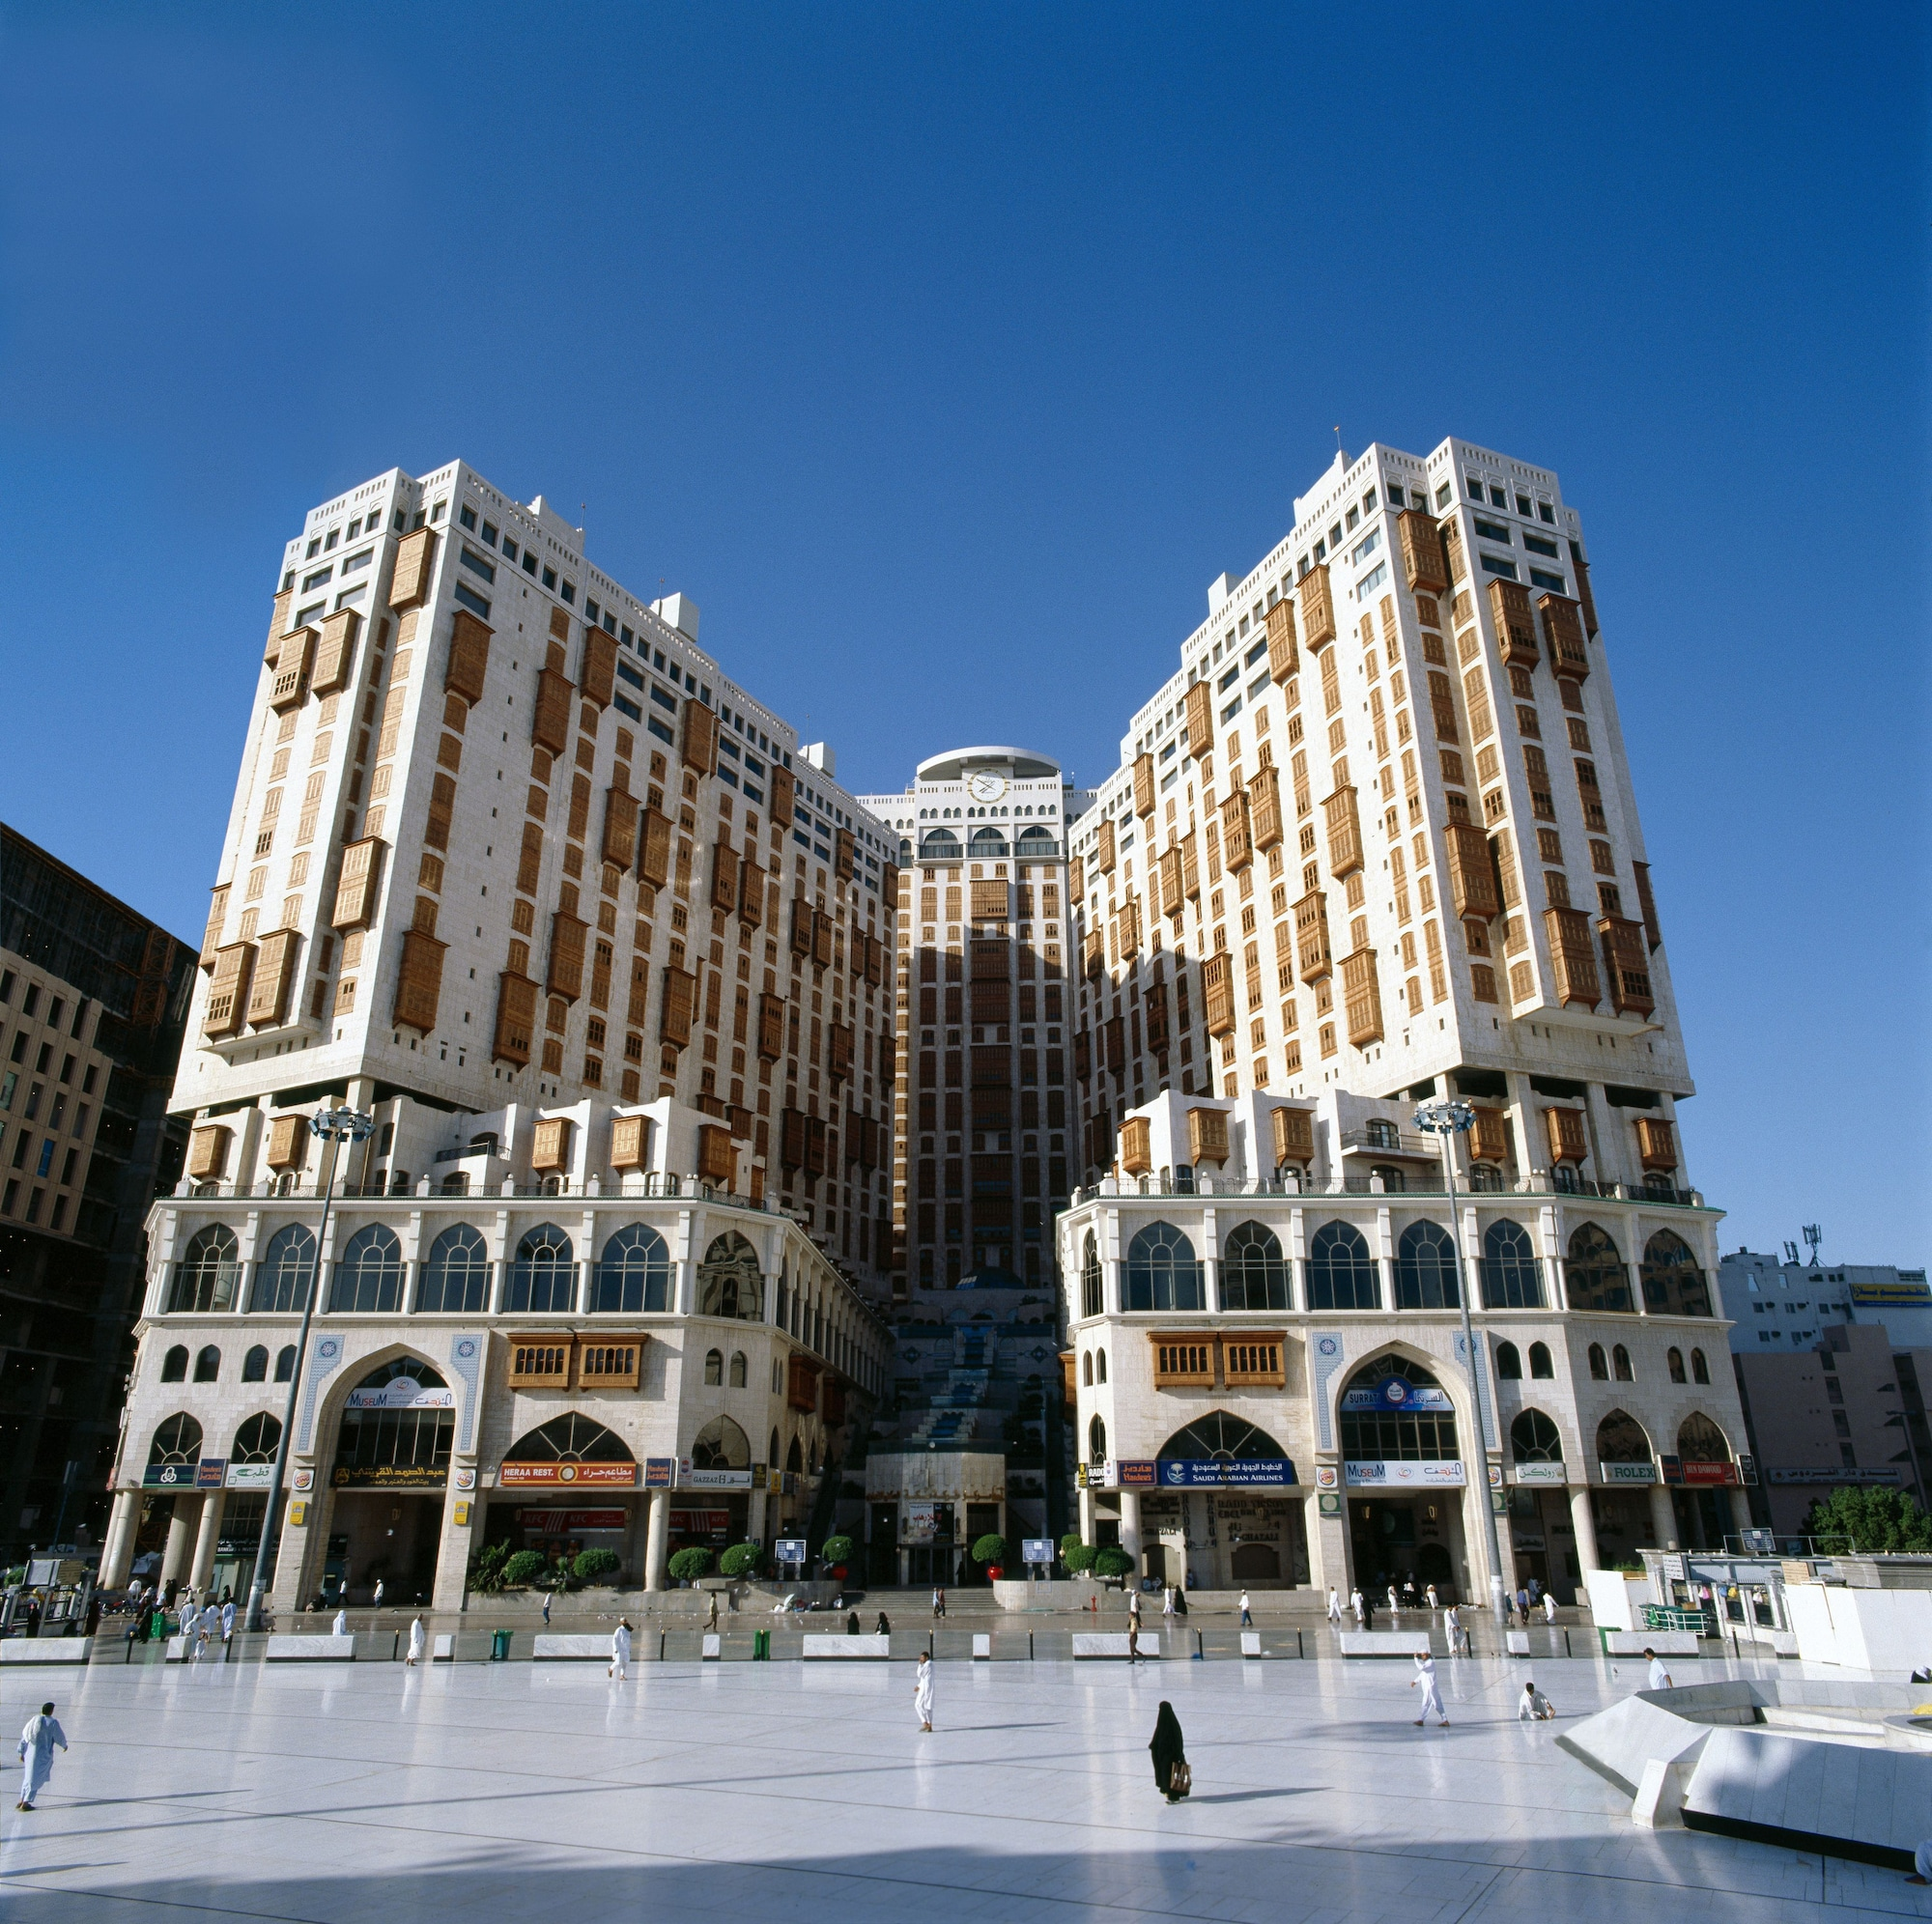 Makkah Millennium Towers,